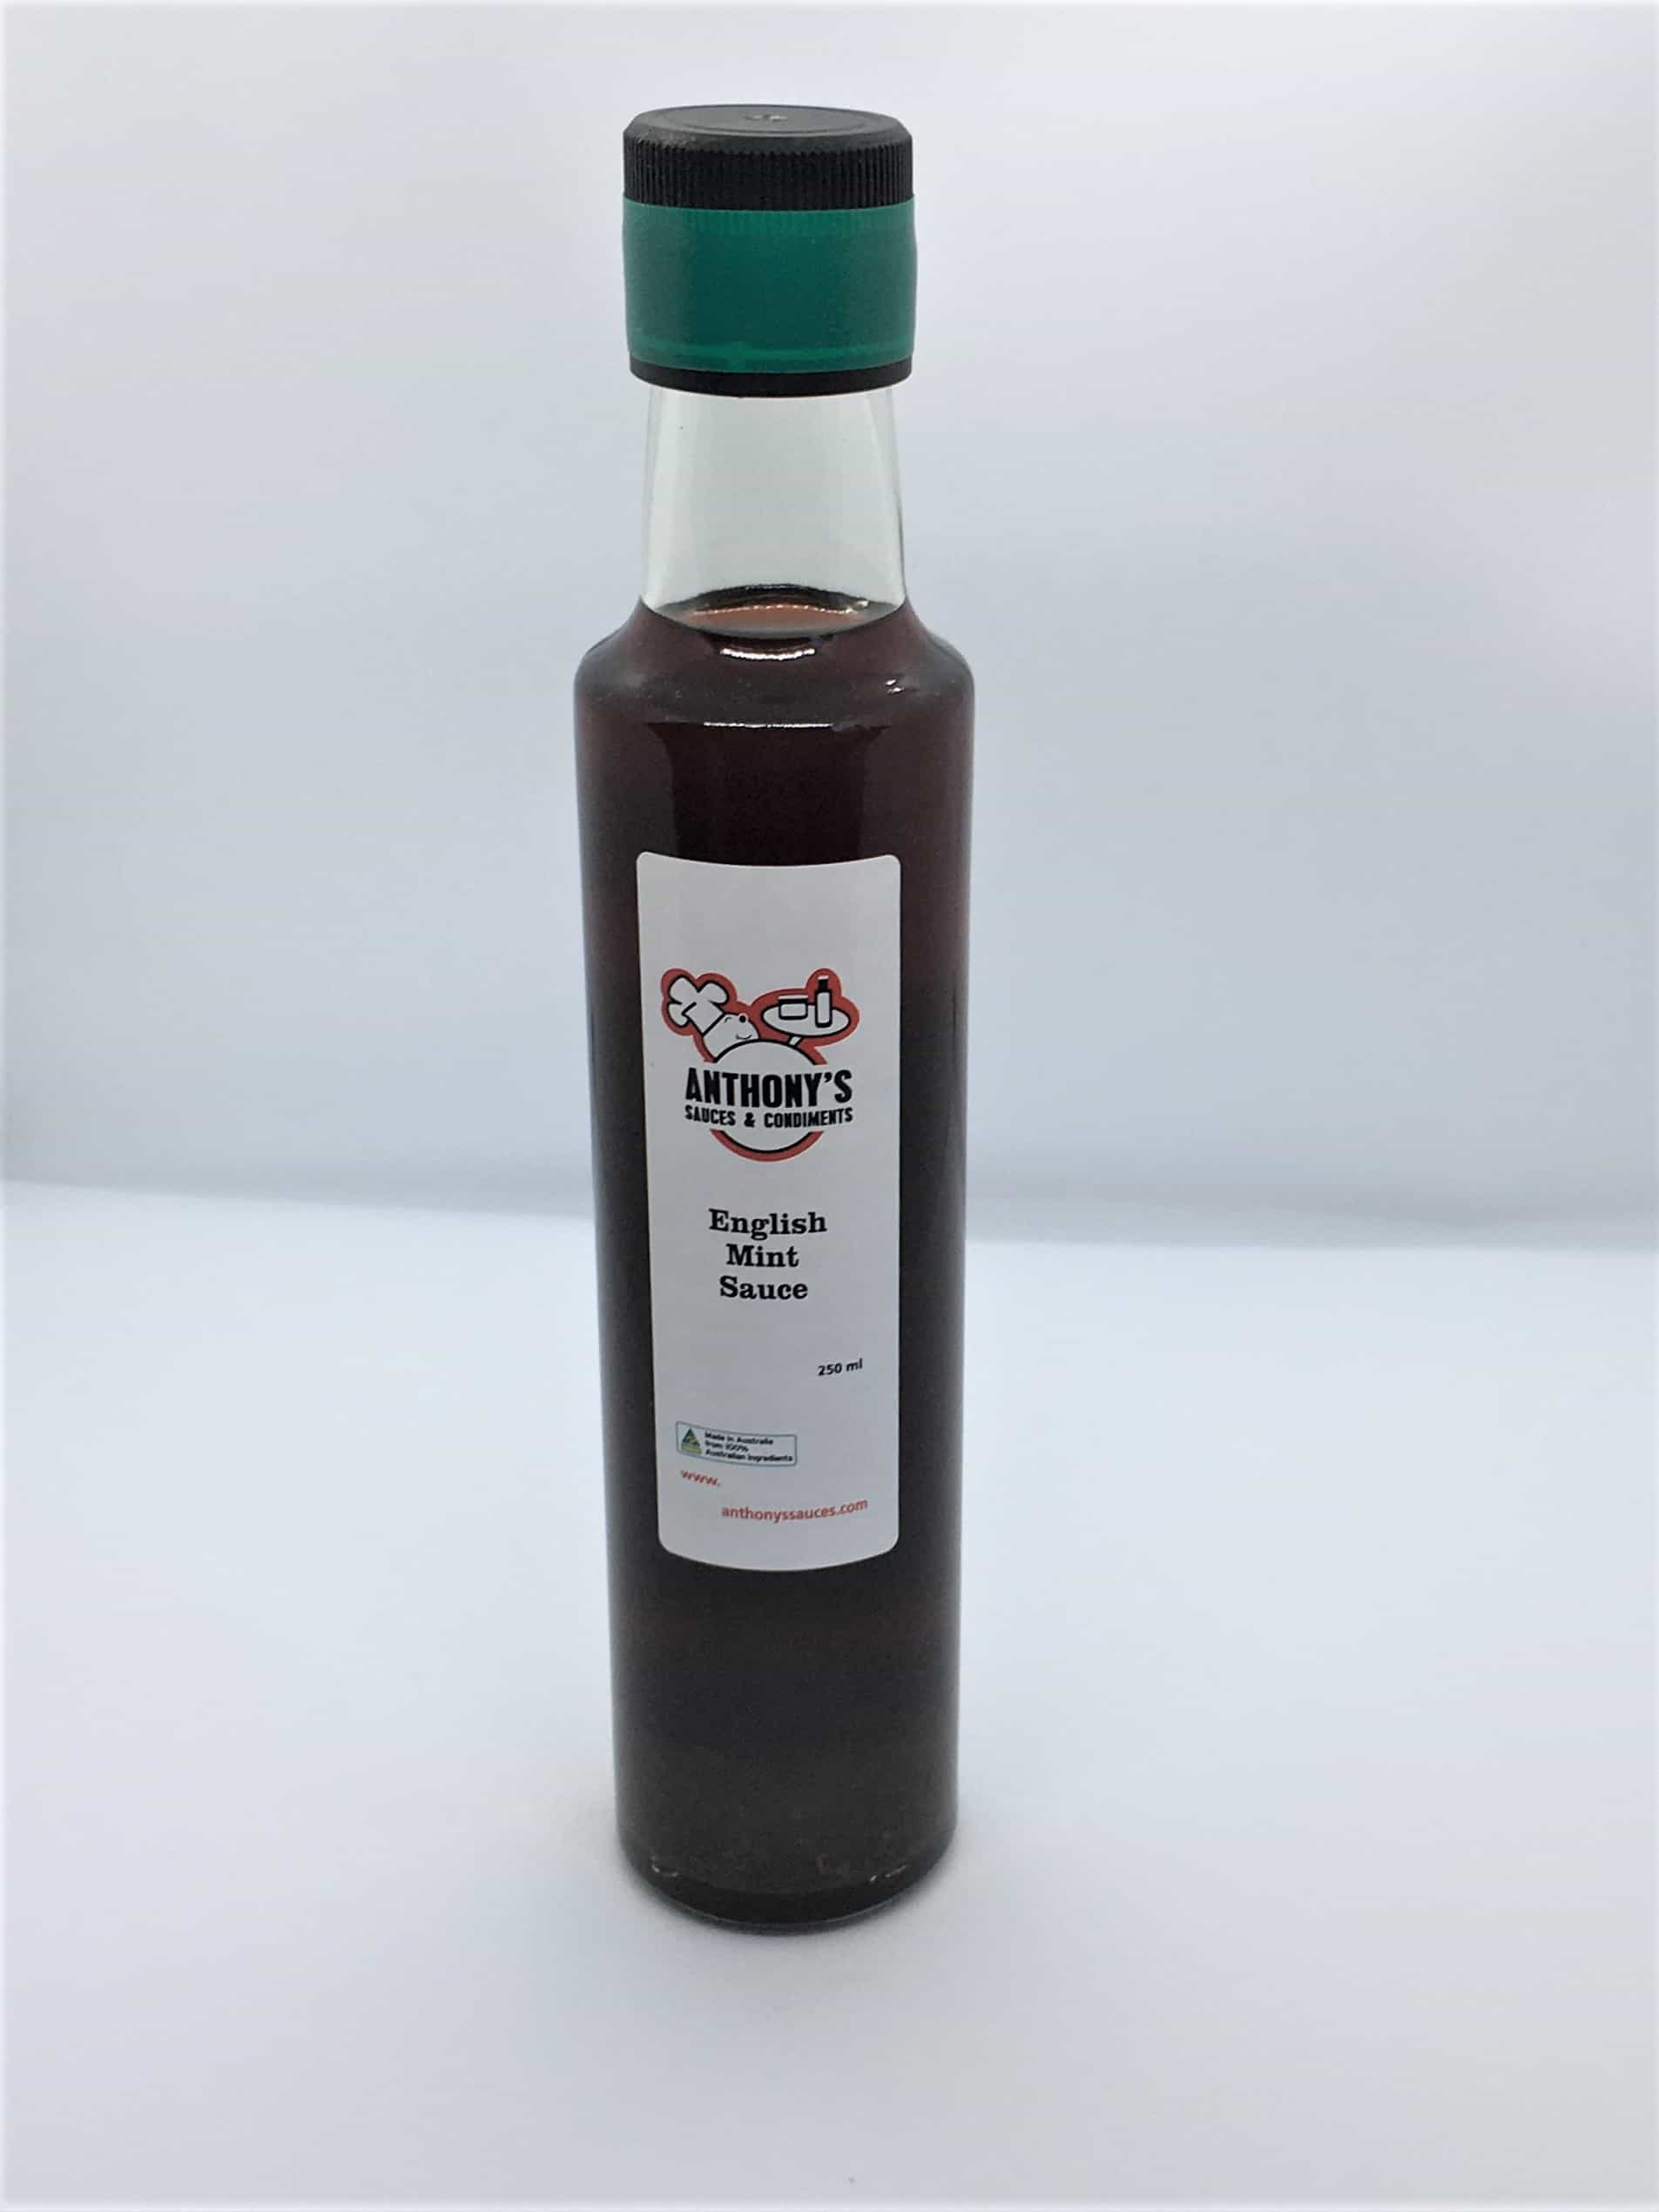 English Mint Sauce